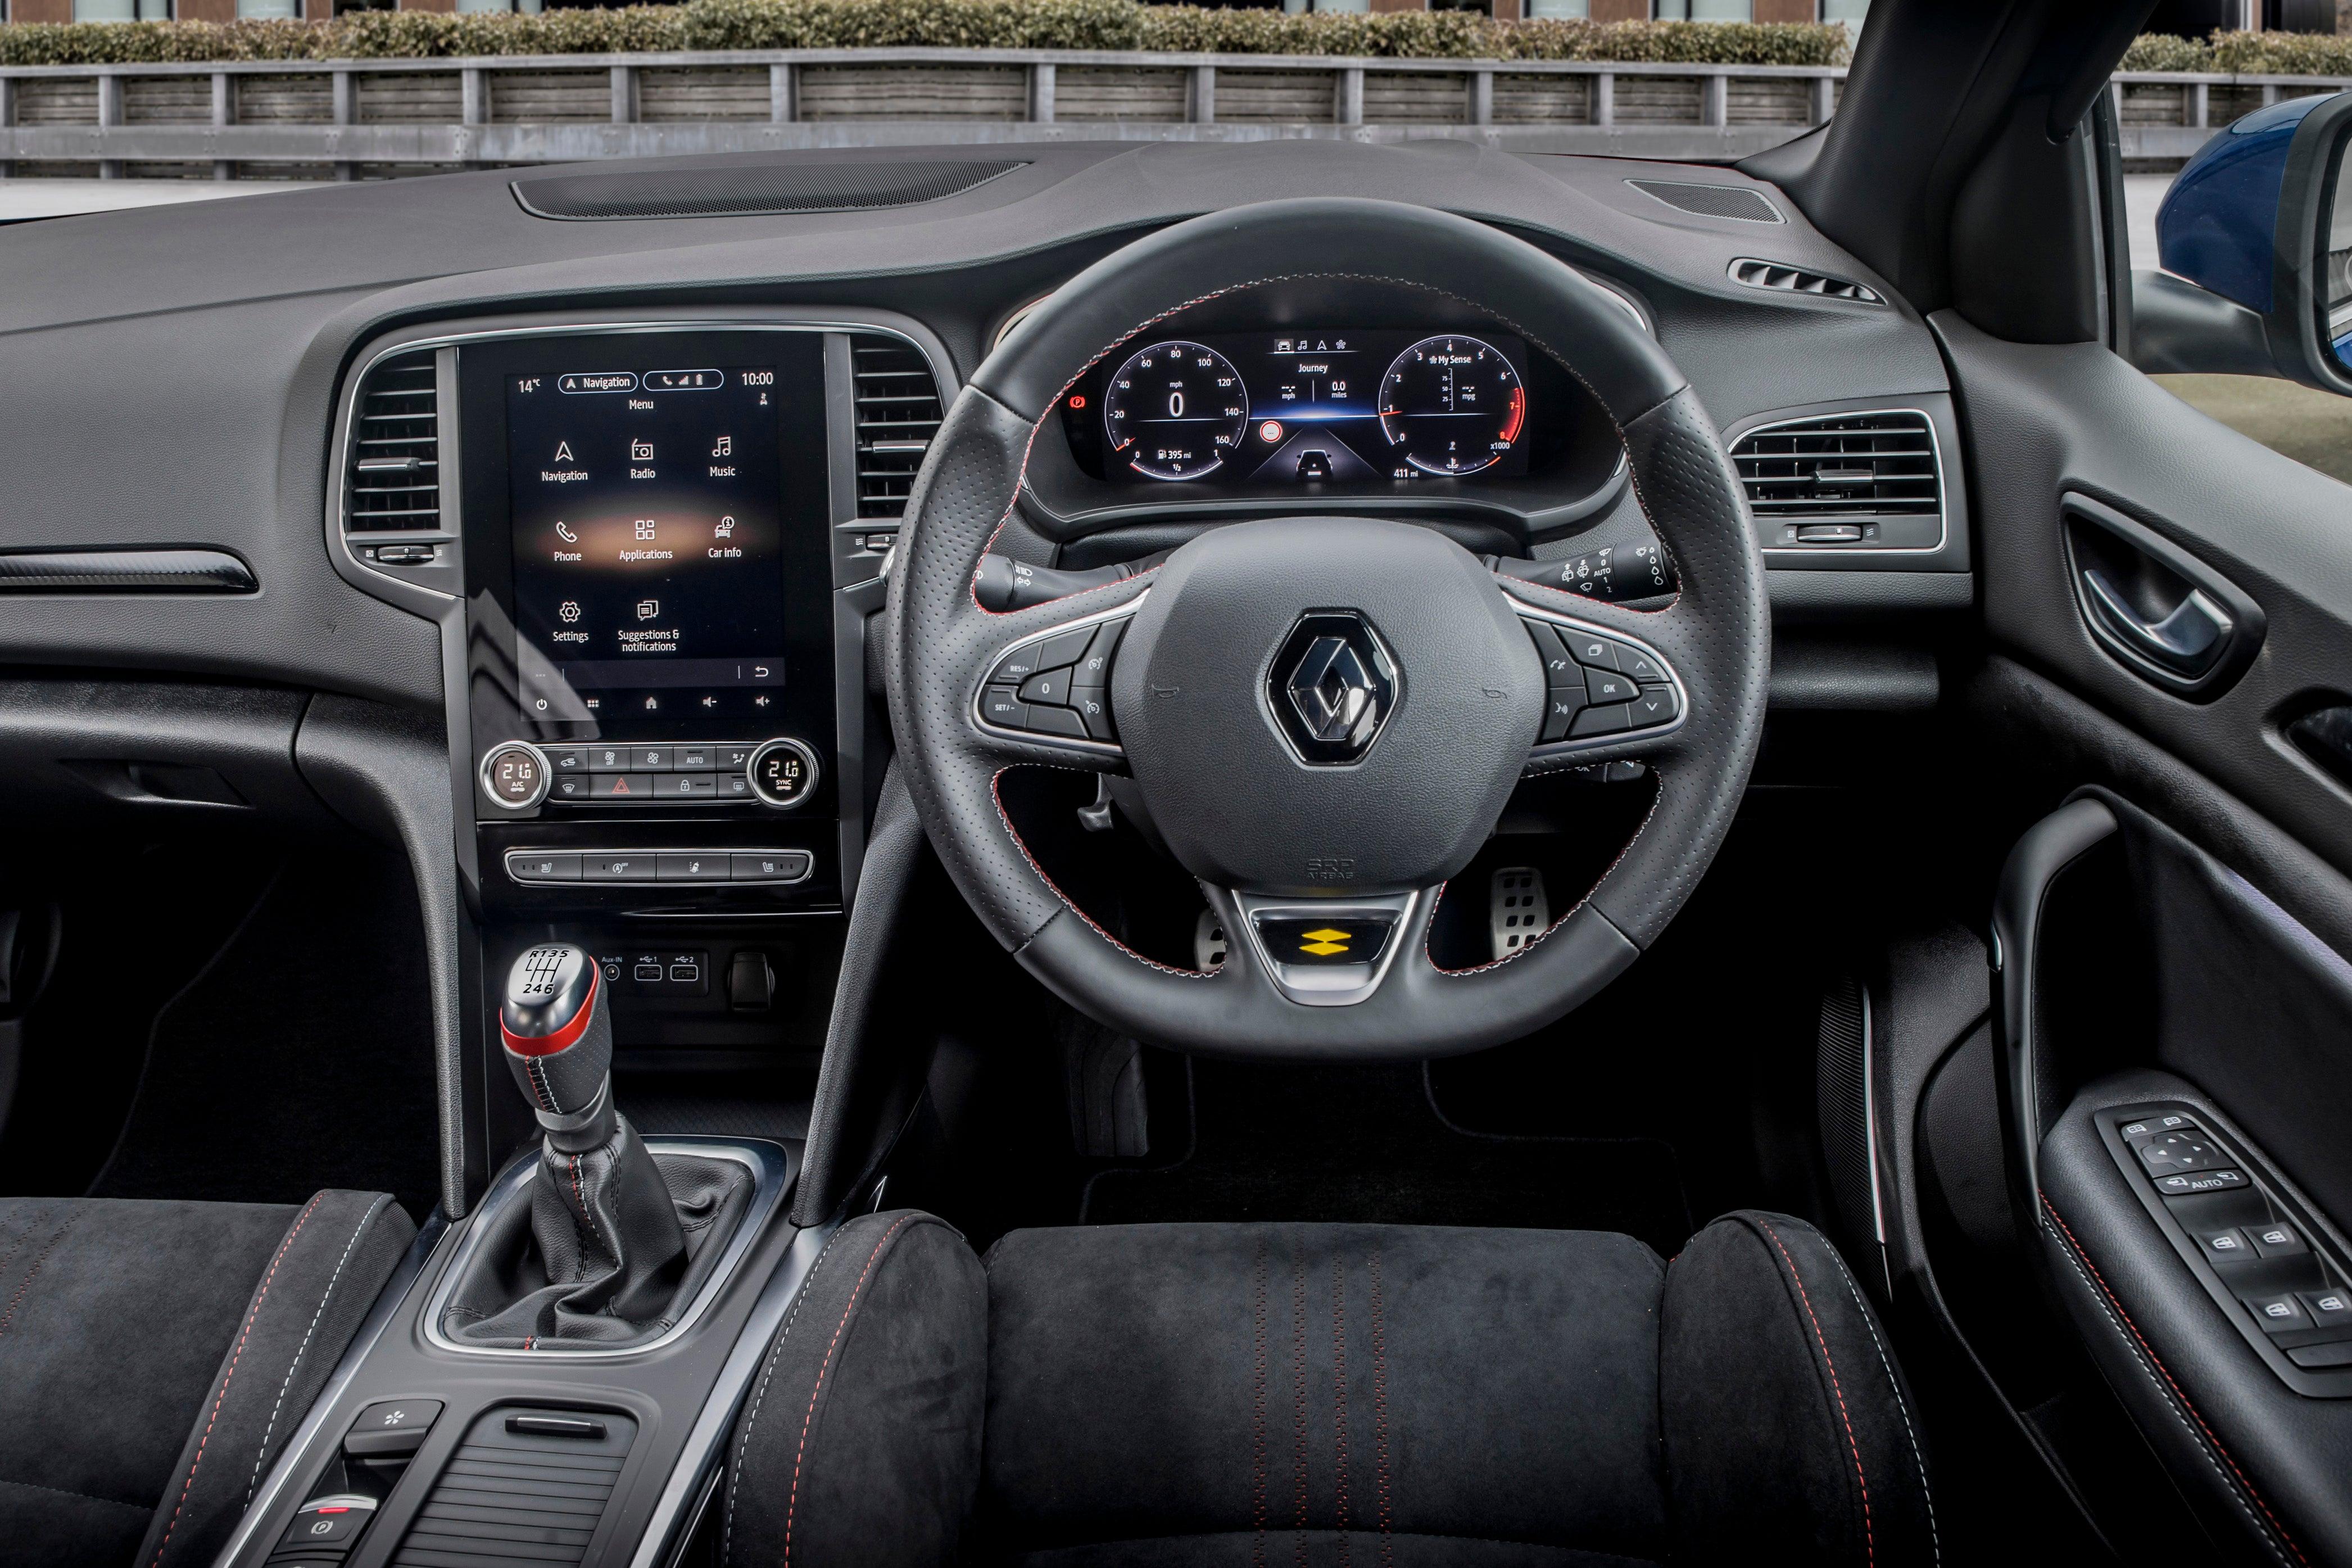 Renault Megane interior